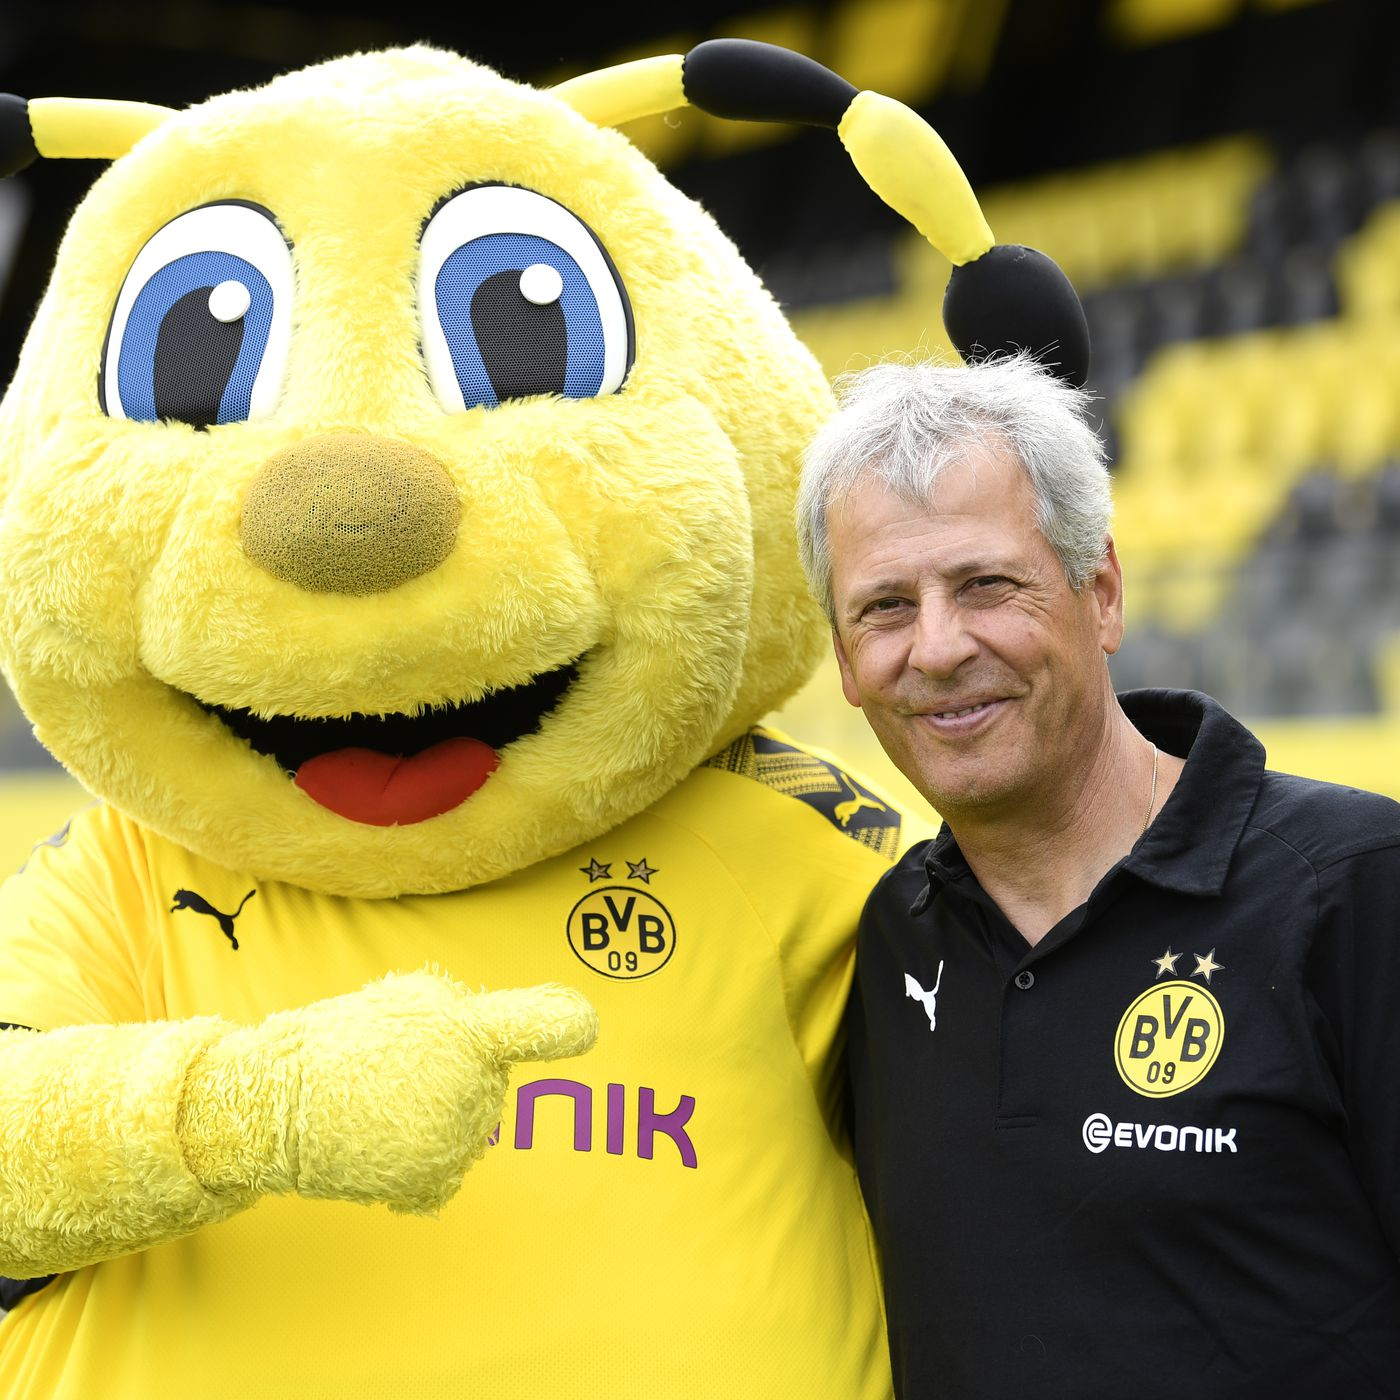 2019 2020 Borussia Dortmund Preview Fear The Wall